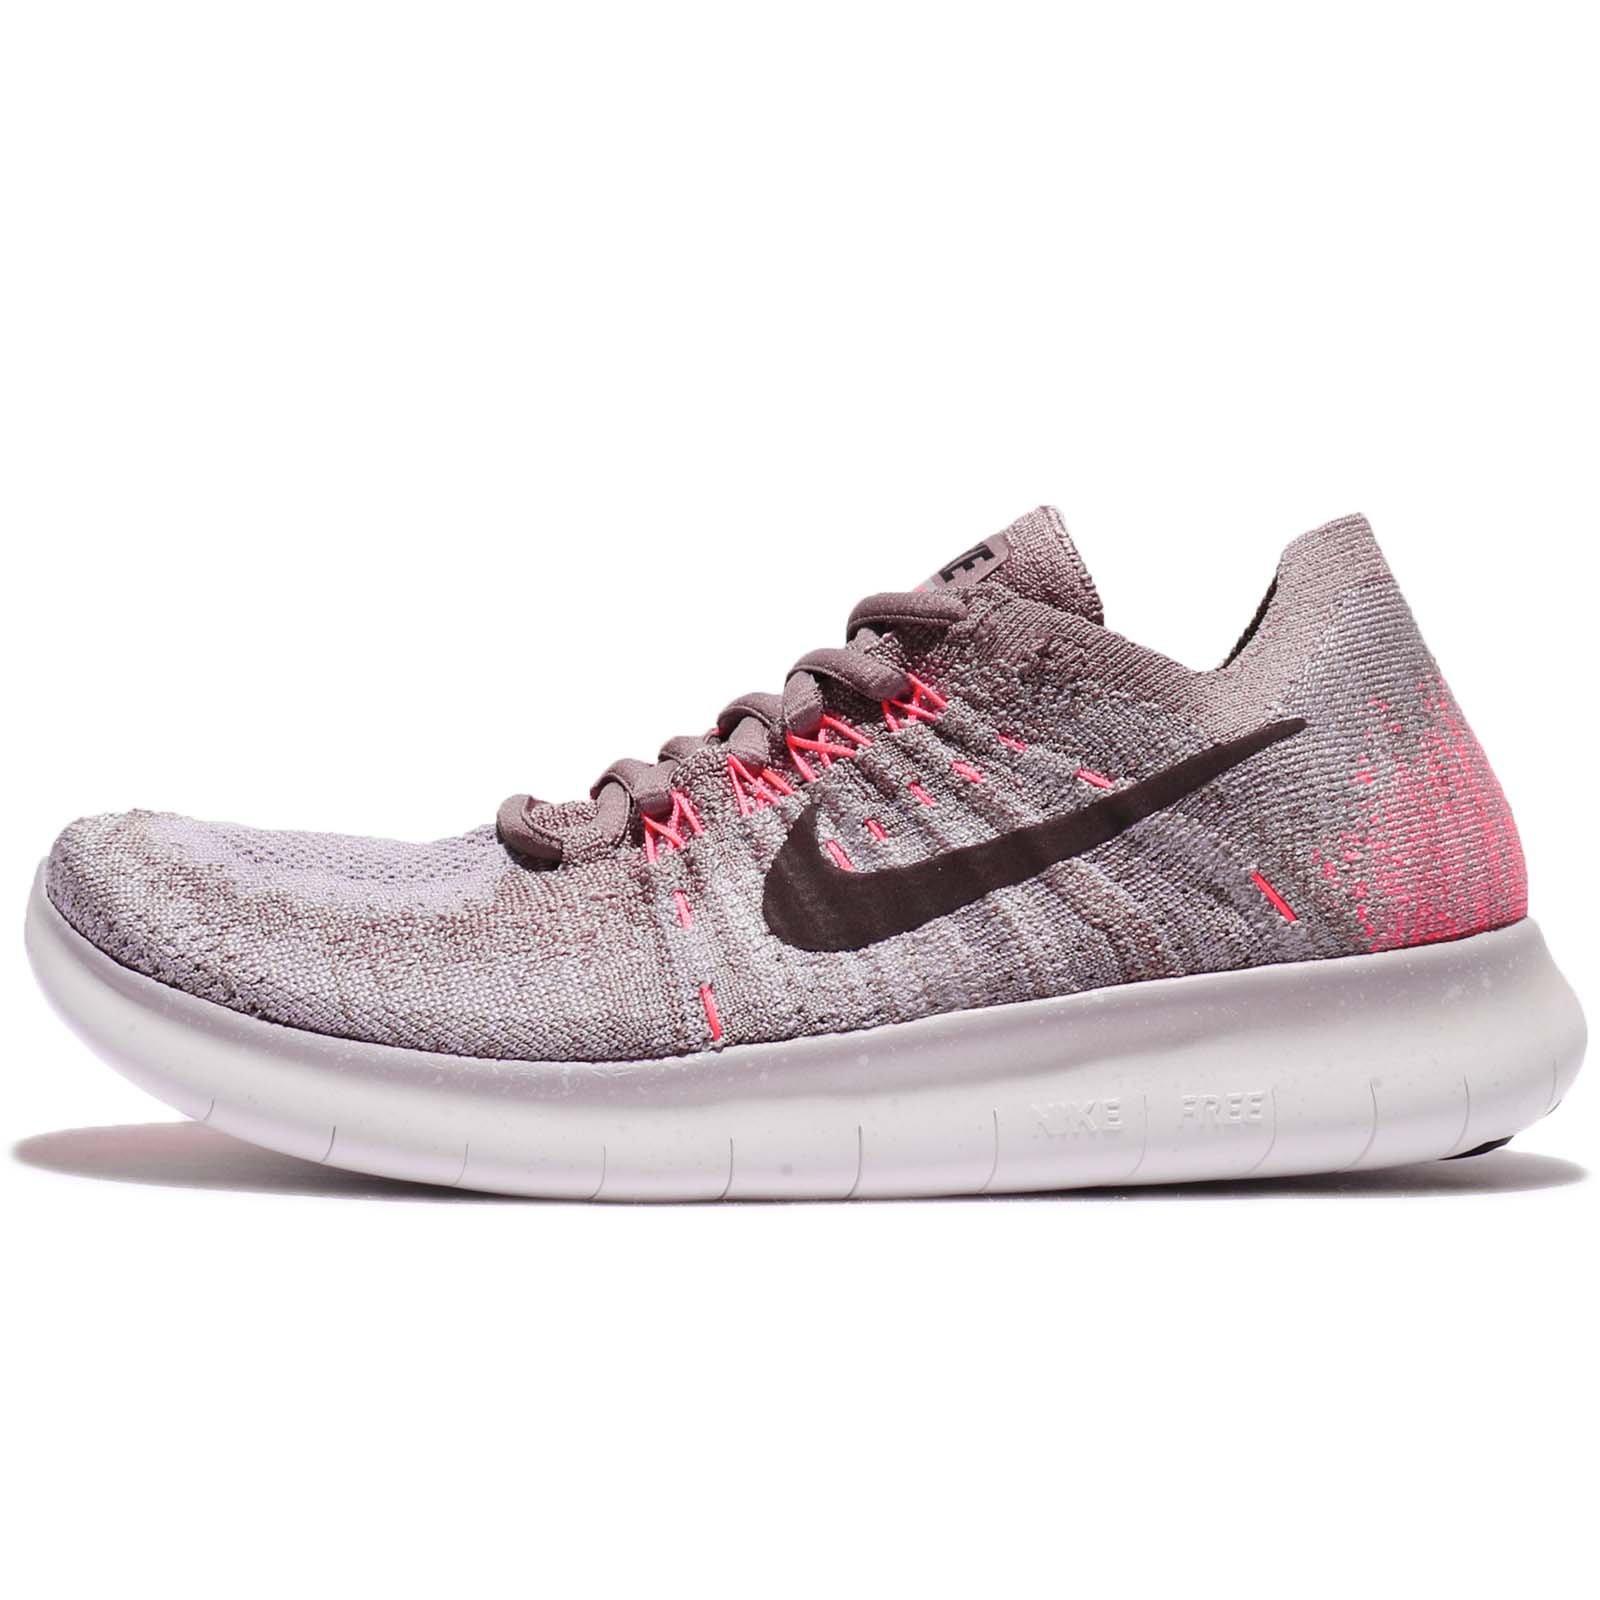 e7541360d7483 Galleon - NIKE Free Rn Flyknit 2017 Running Women Shoes Size 8